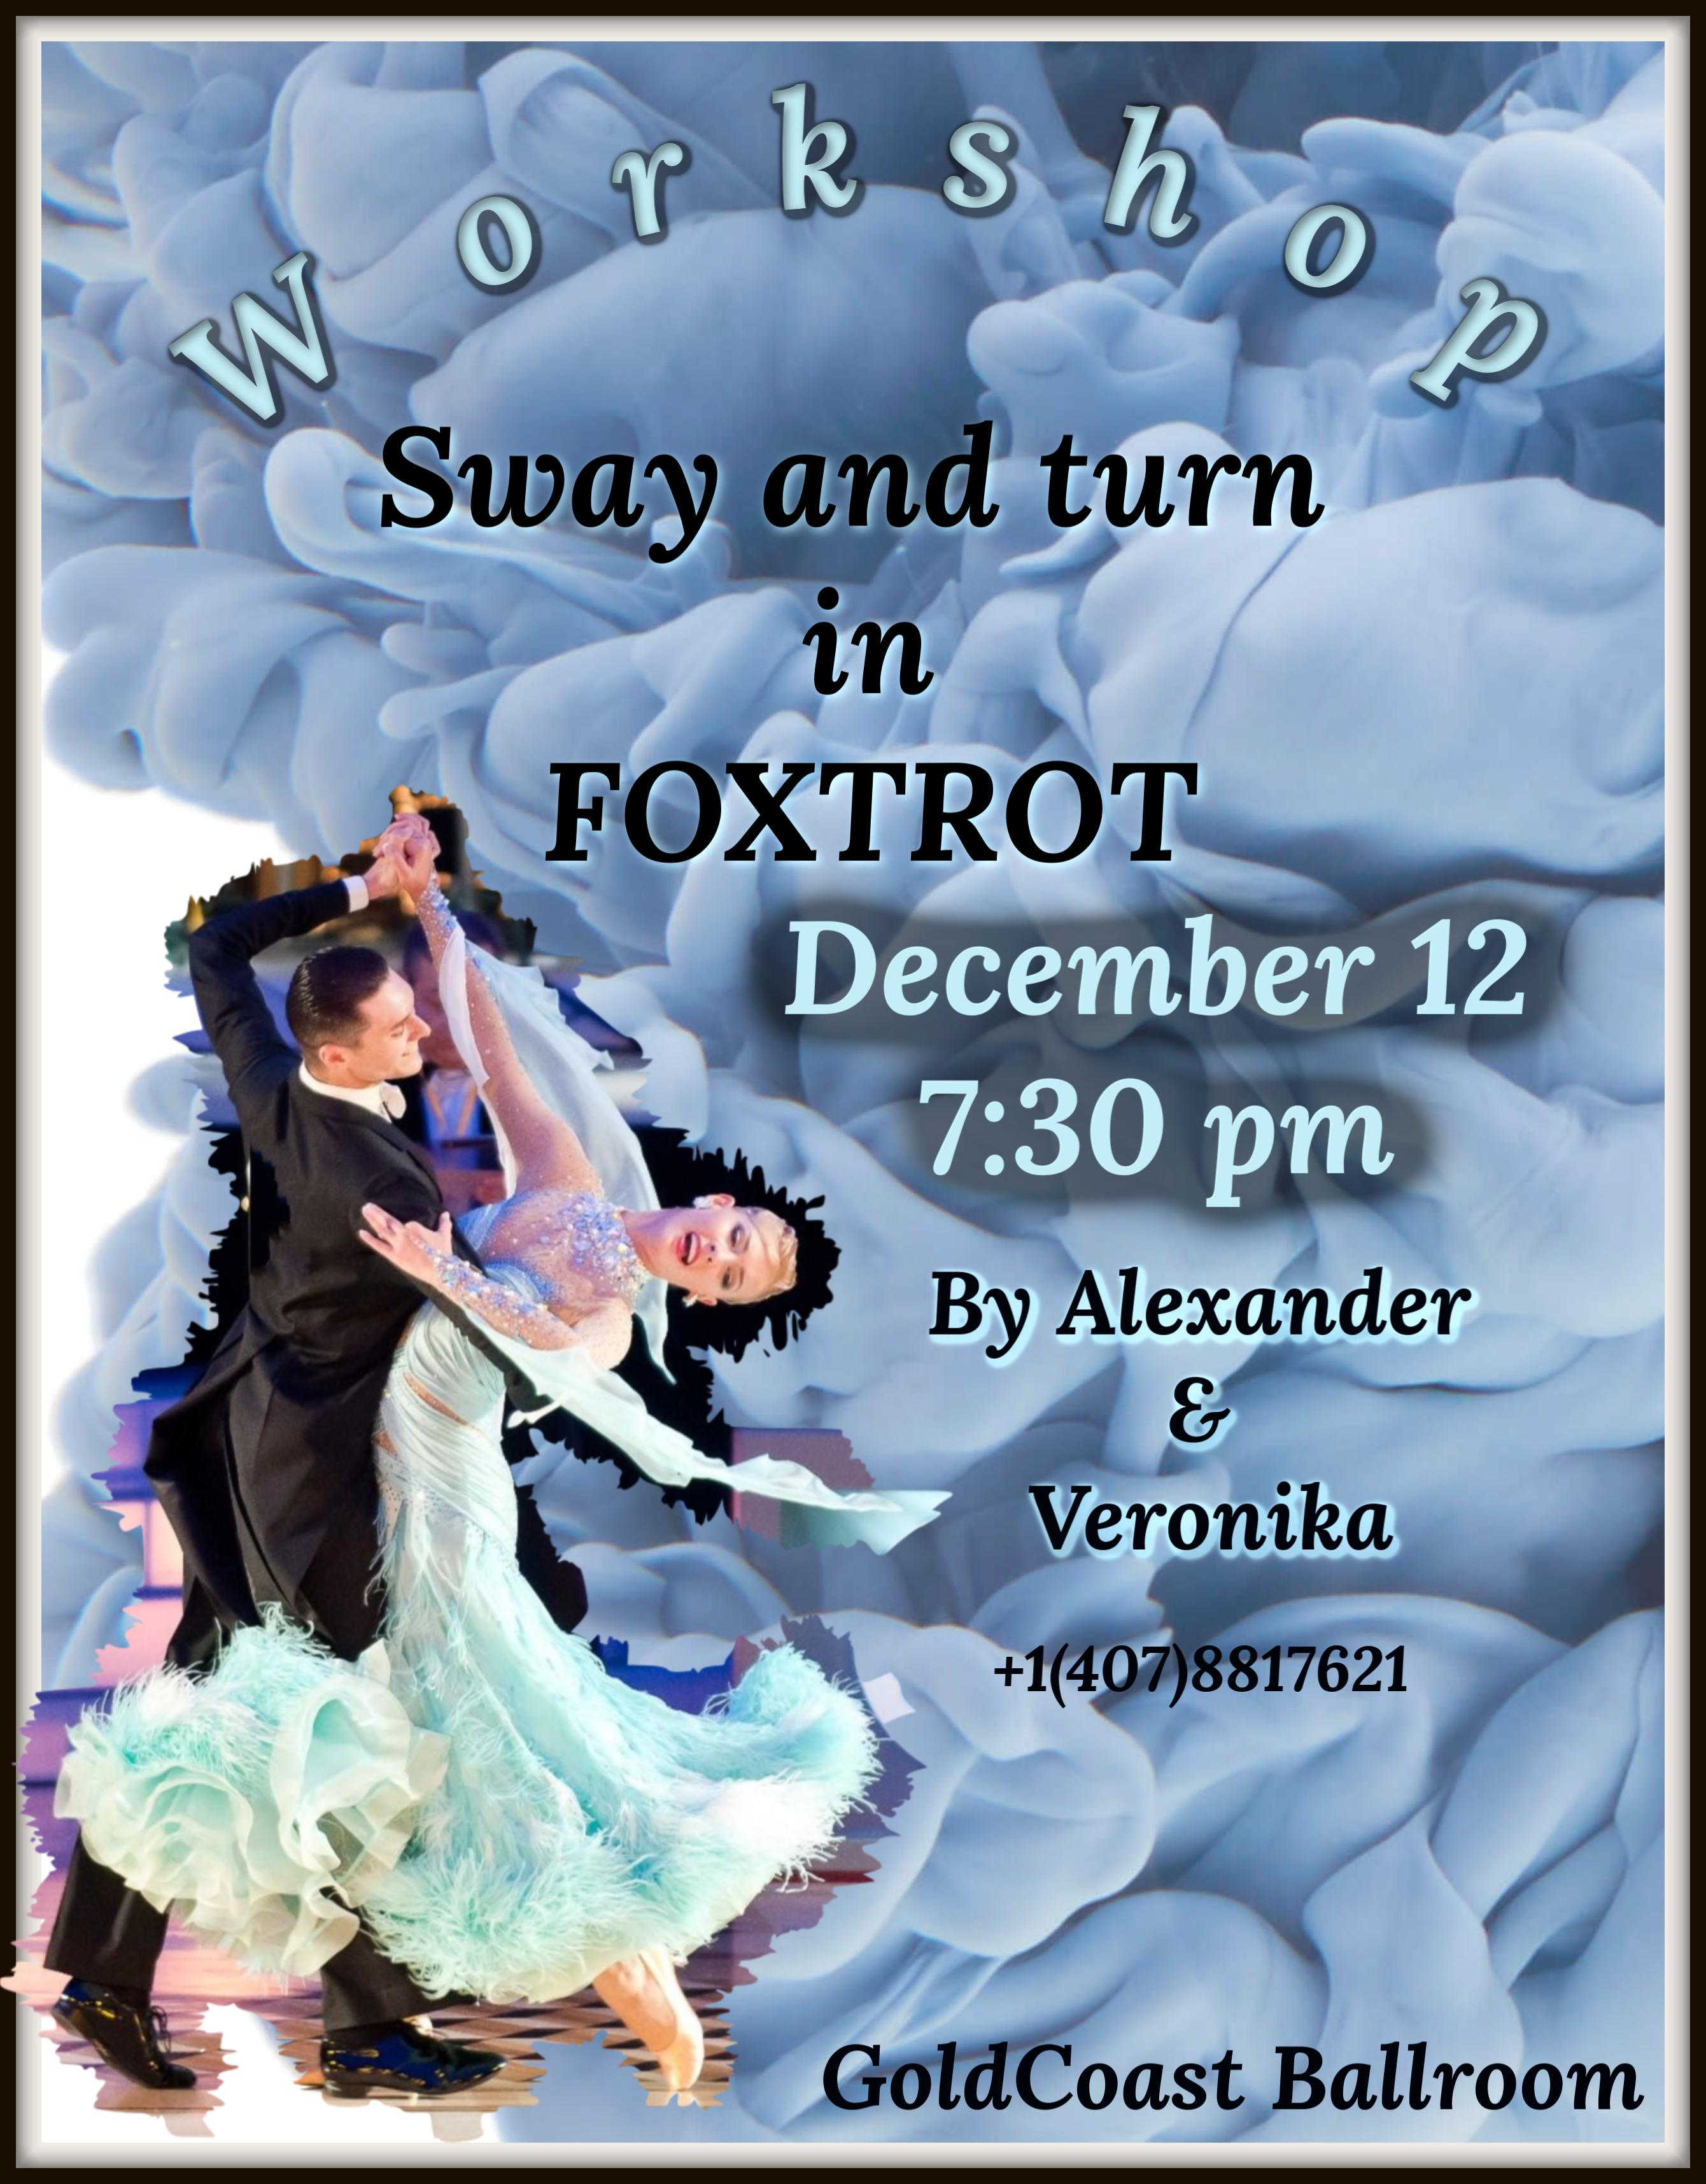 Alexander & Veronika Voskalchuk - Sway & Turn in Foxtrot - Workshop - 7:30 PM - December 12, 2018 - at Goldcoast Ballroom!